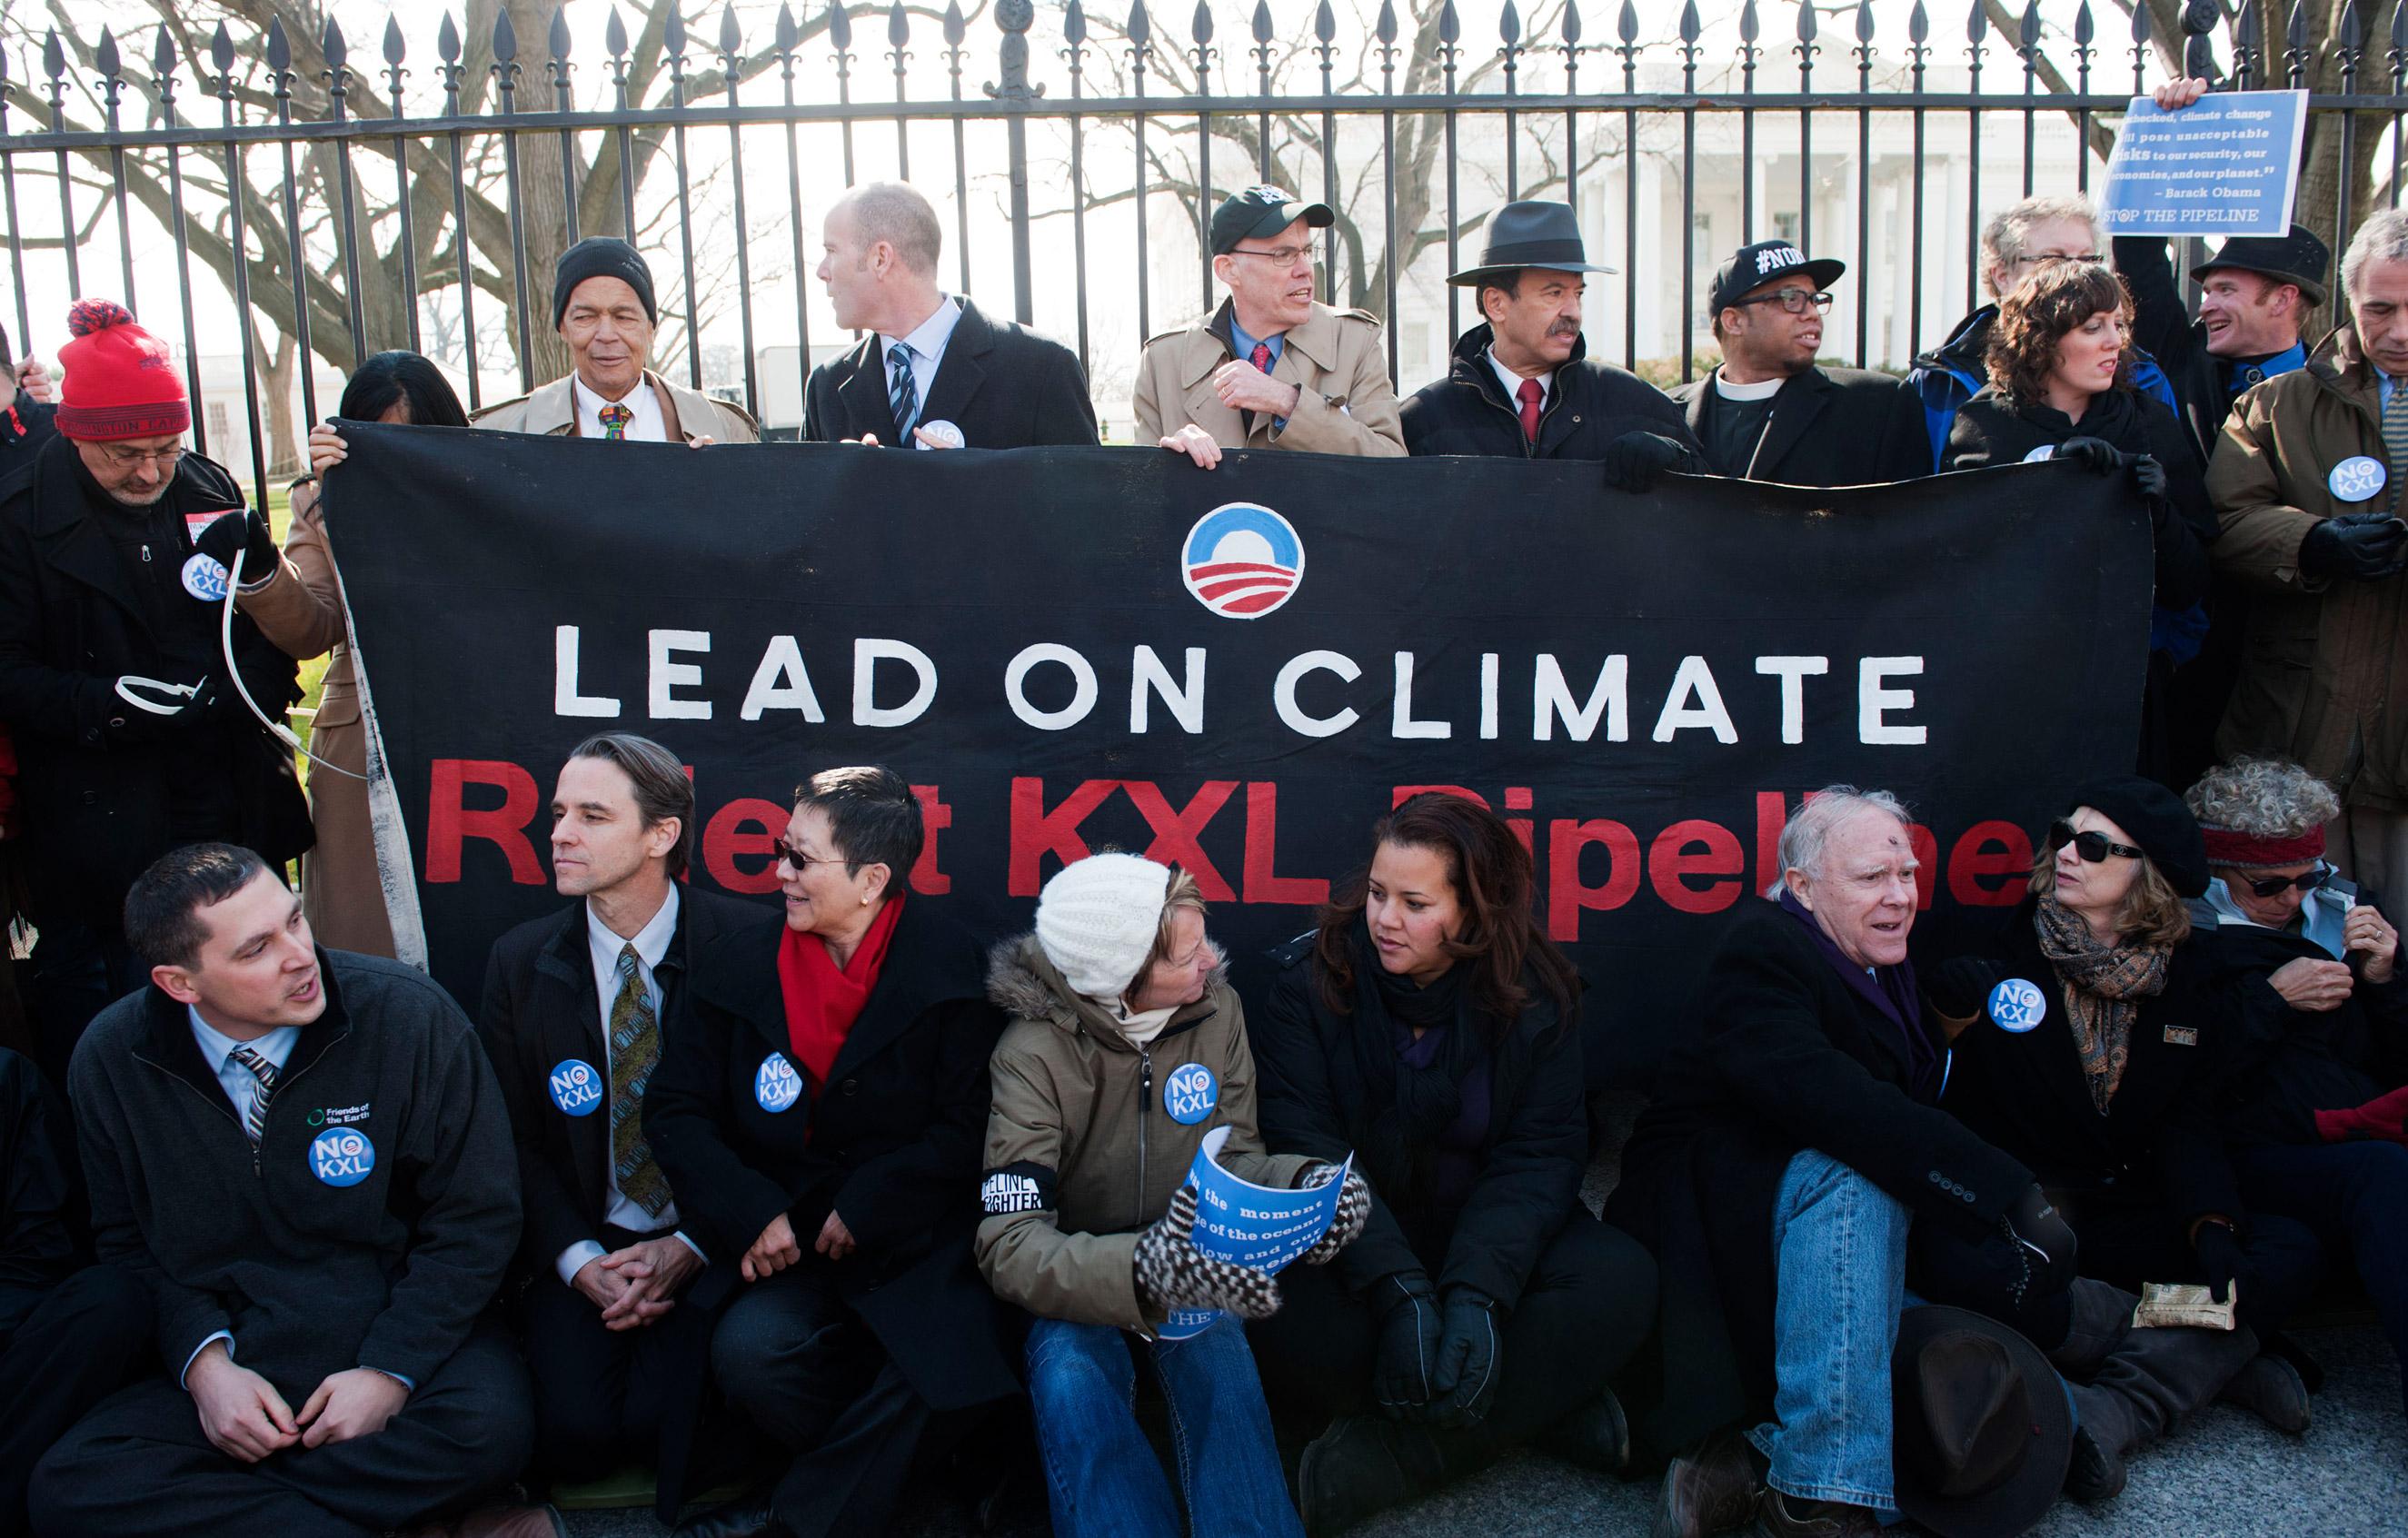 Julian Bond, Michael Brune, Bill McKibbin and Lennox Yearwood protest against Keystone XL Pipeline at Lafayette Park on Feb. 13, 2013 in Washington.